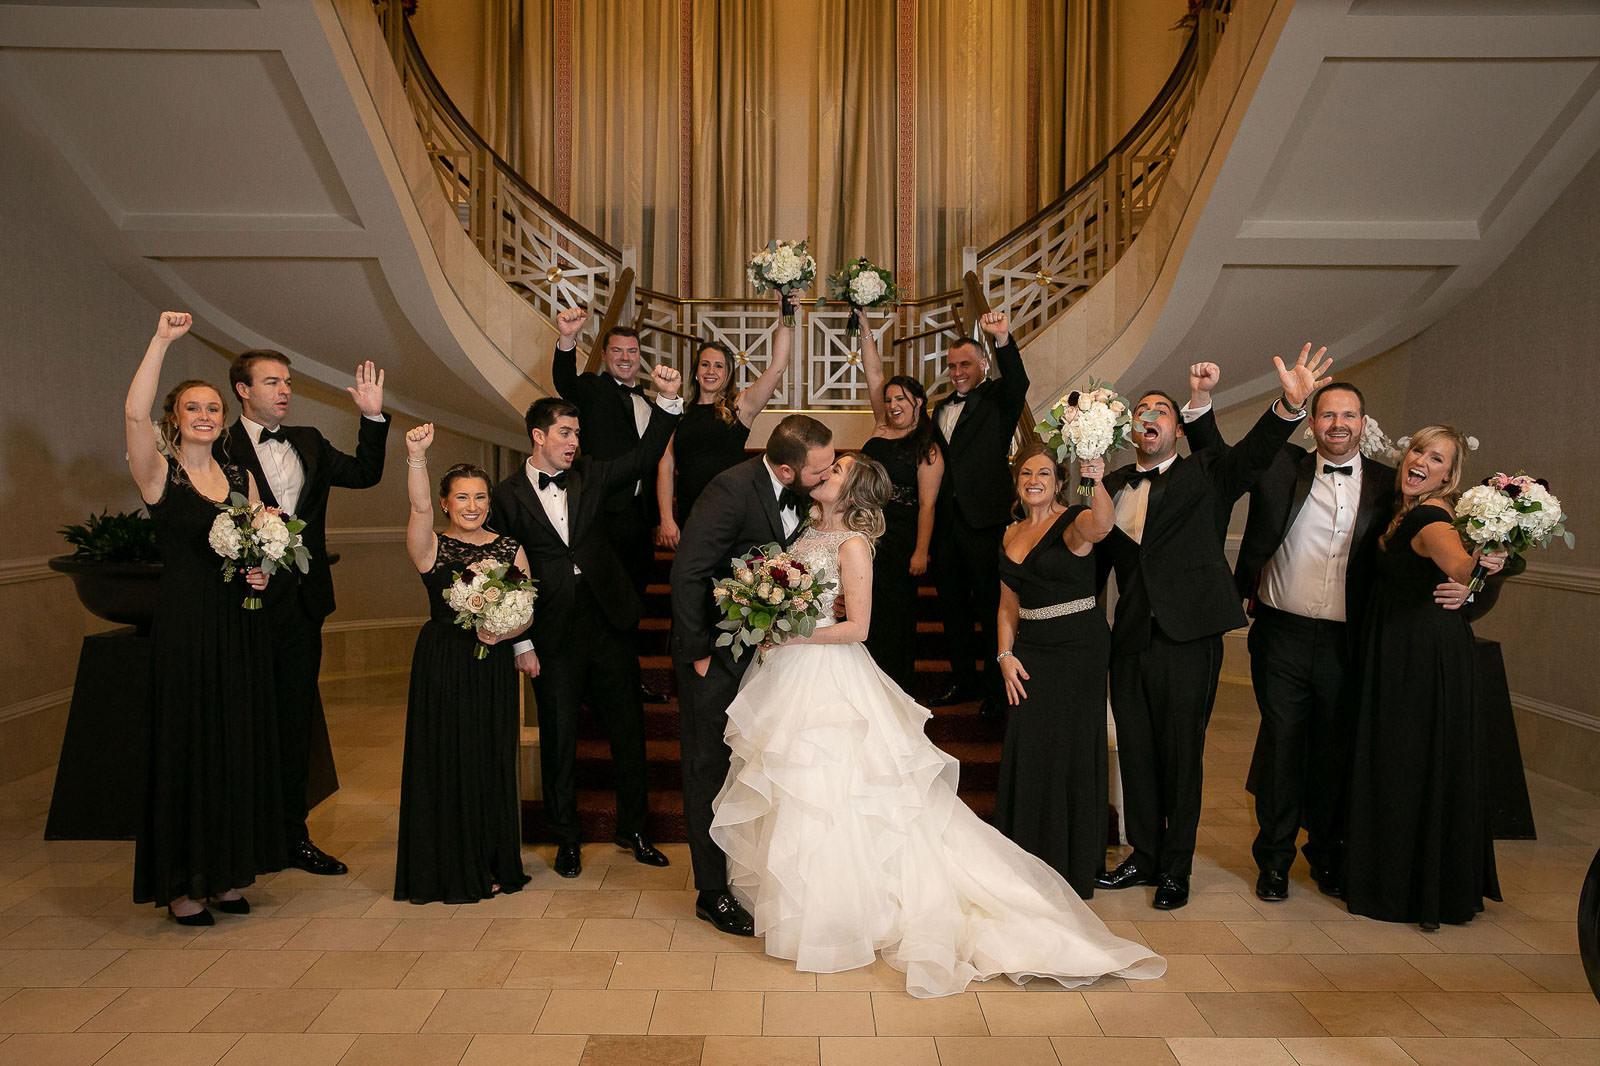 Omni Hotel Providence, Omni, Providence, Rhode Island, RI, Wedding, city wedding, November wedding, Tracy Jenkins Photography, RI wedding photographer, Rhode Island Wedding photographer, wedding party, formals